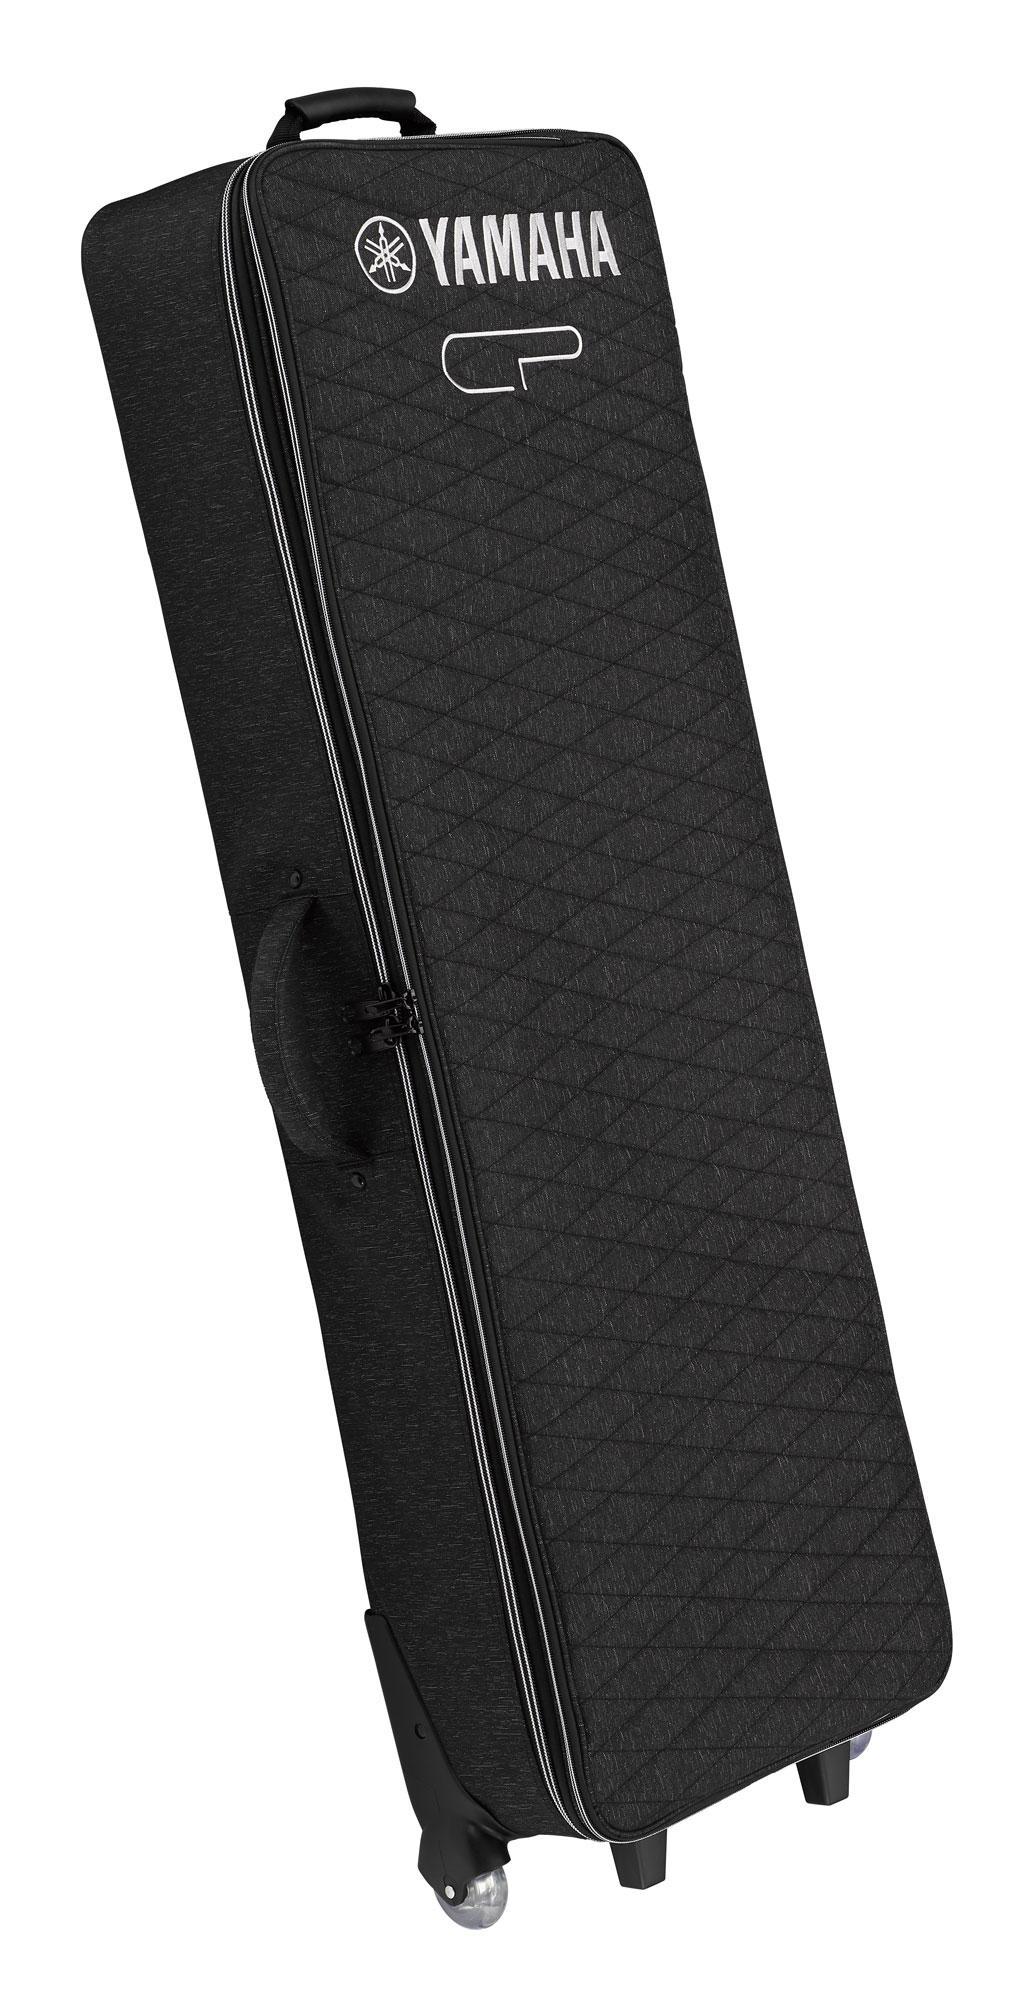 Zubehoerkeyboards - Yamaha SC CP73 Soft Bag - Onlineshop Musikhaus Kirstein